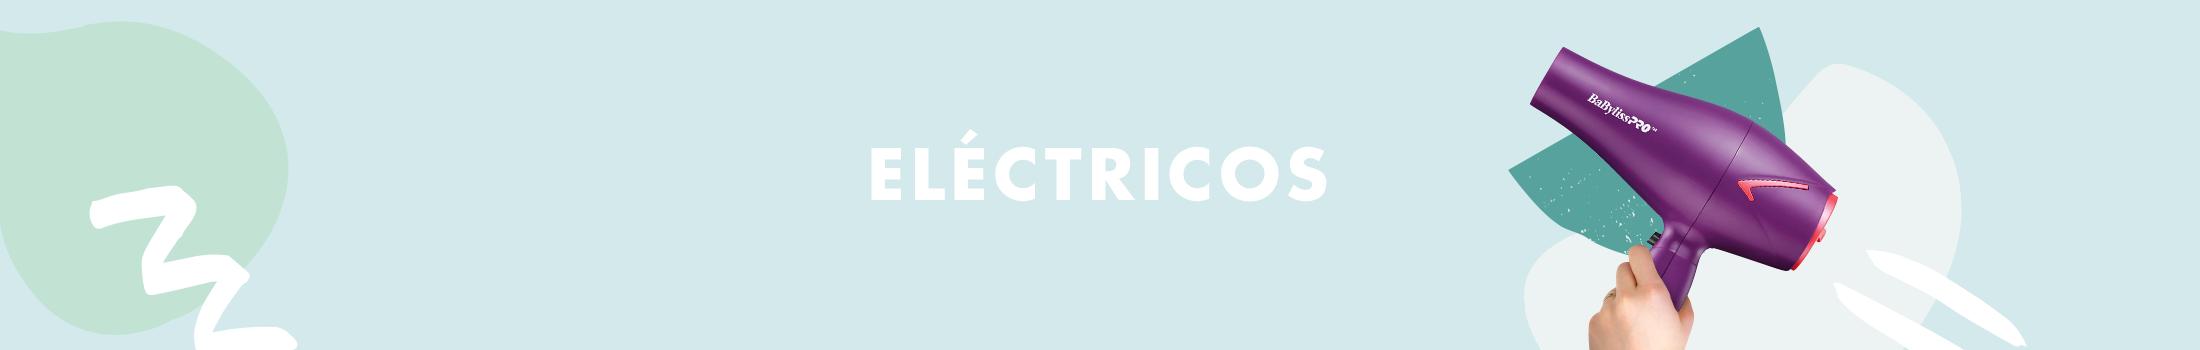 banner electricos